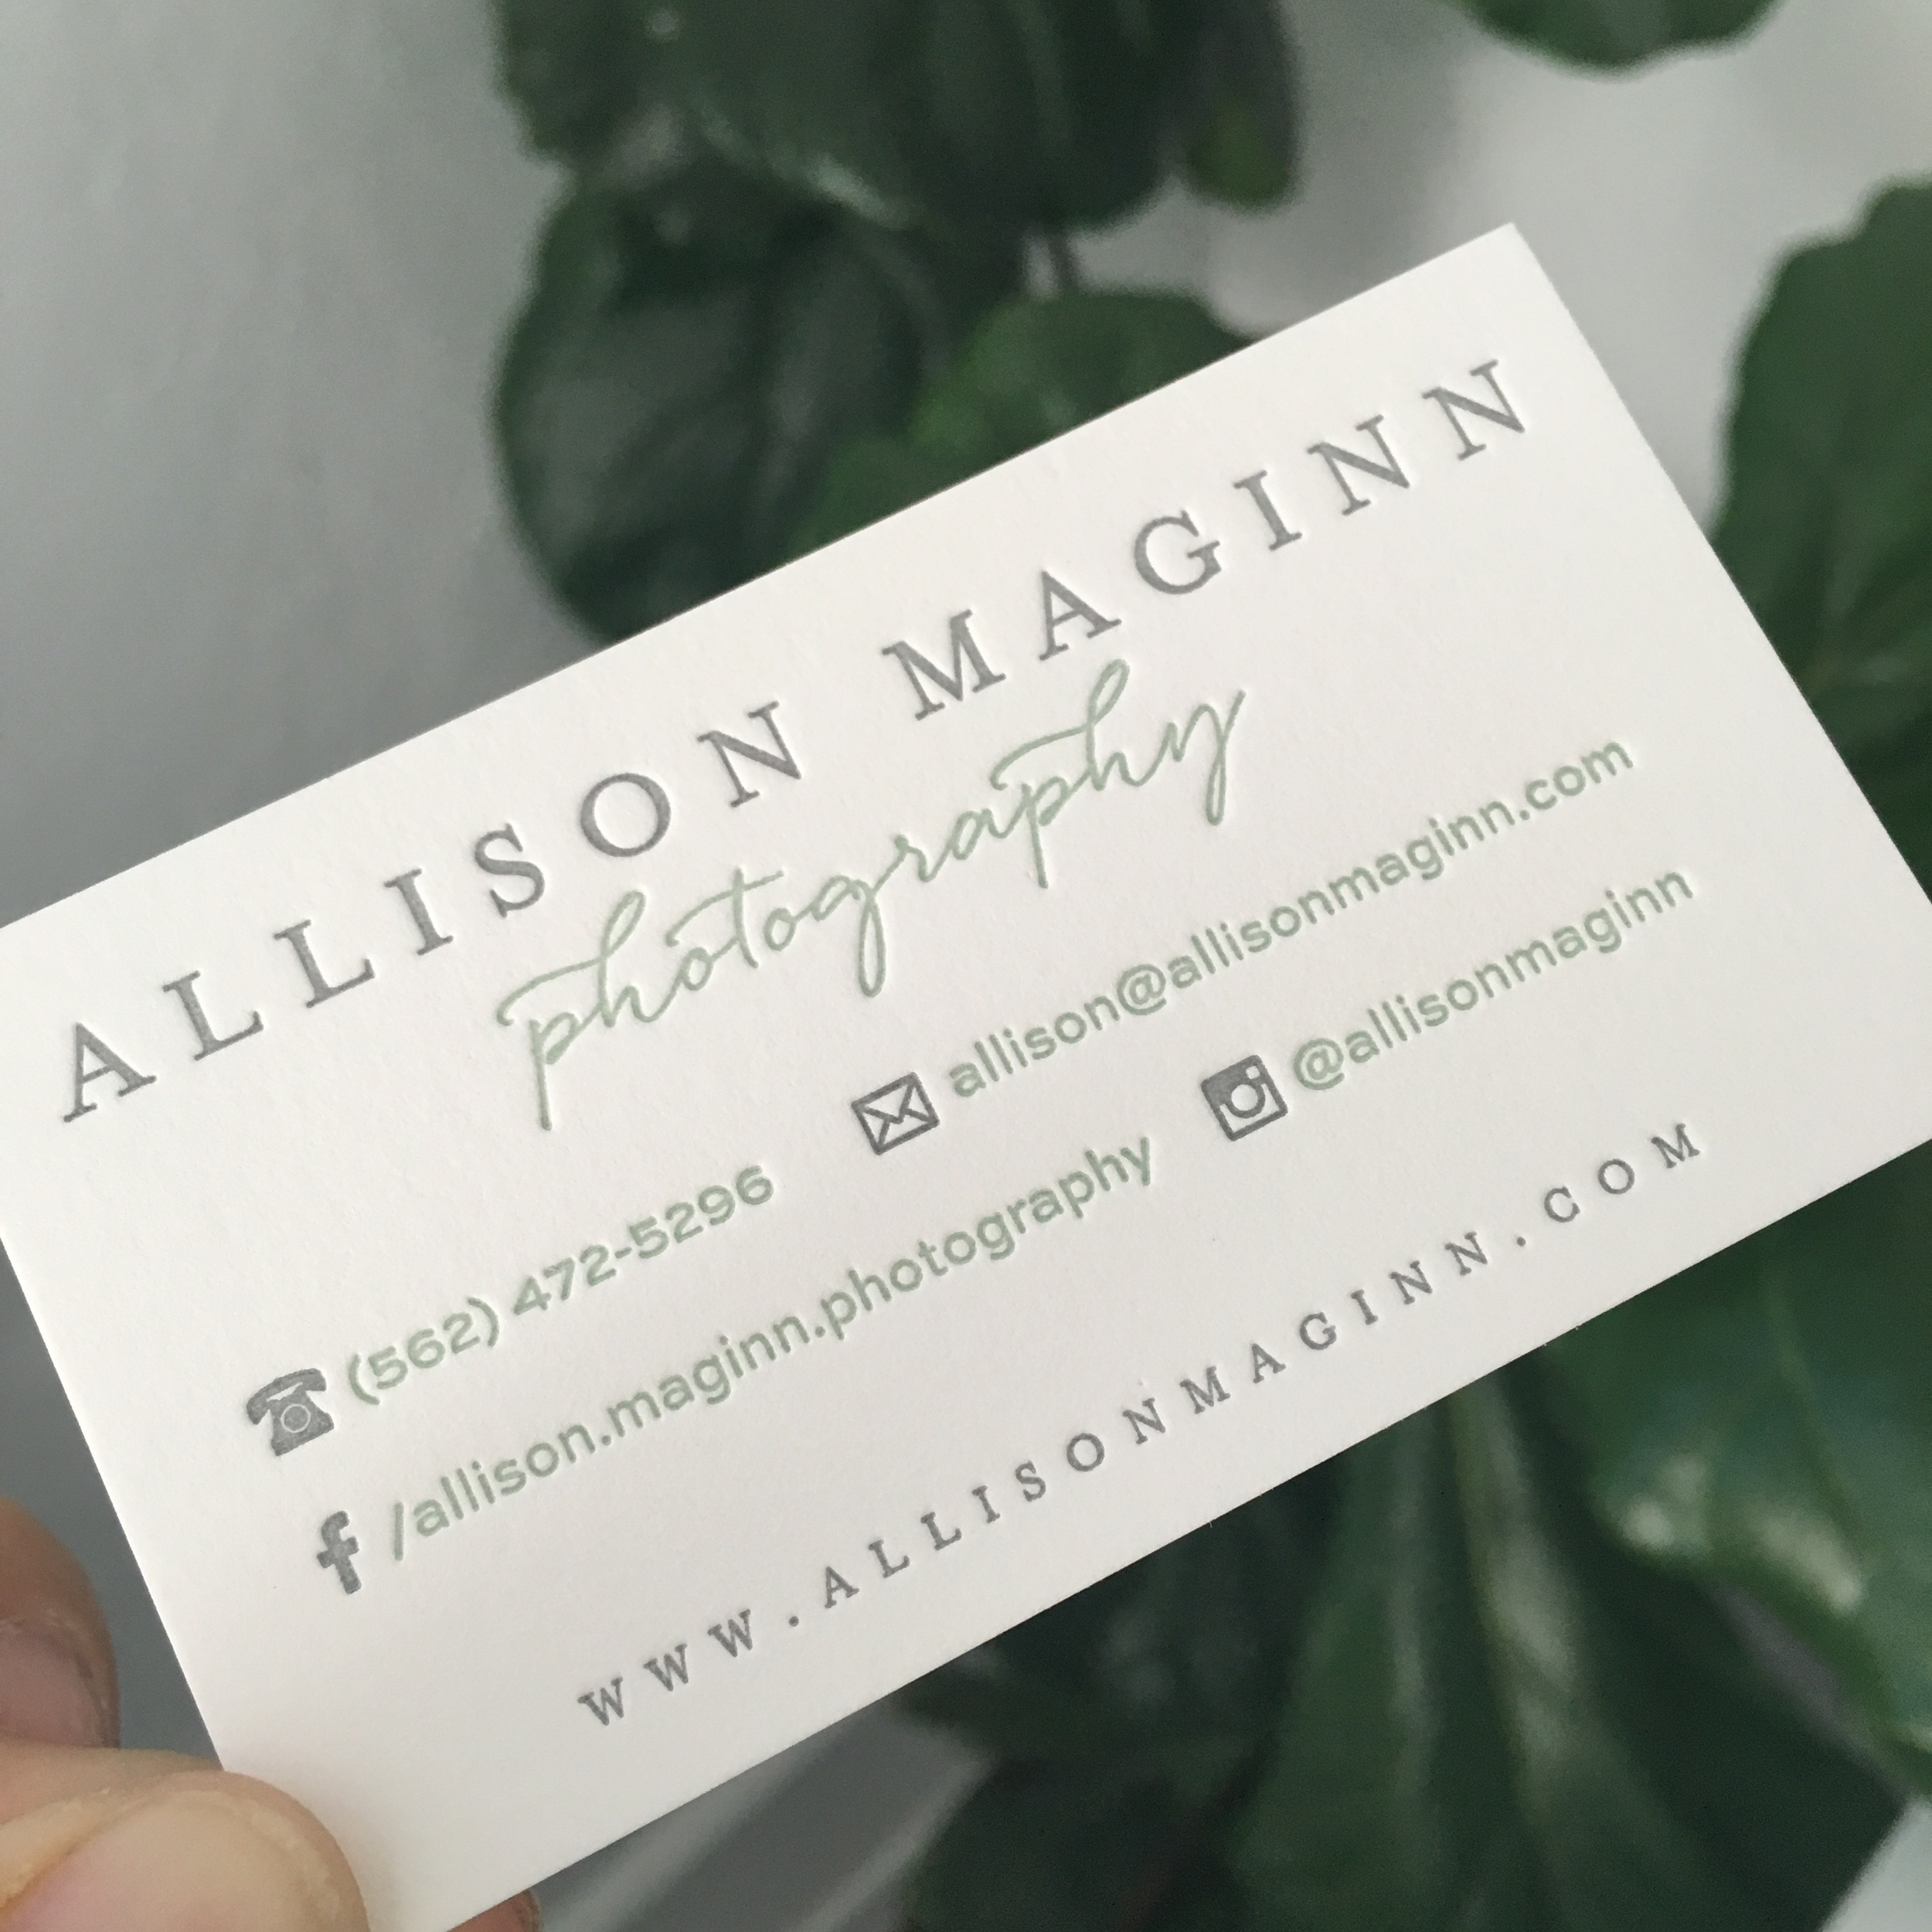 Letterpress business card design & print